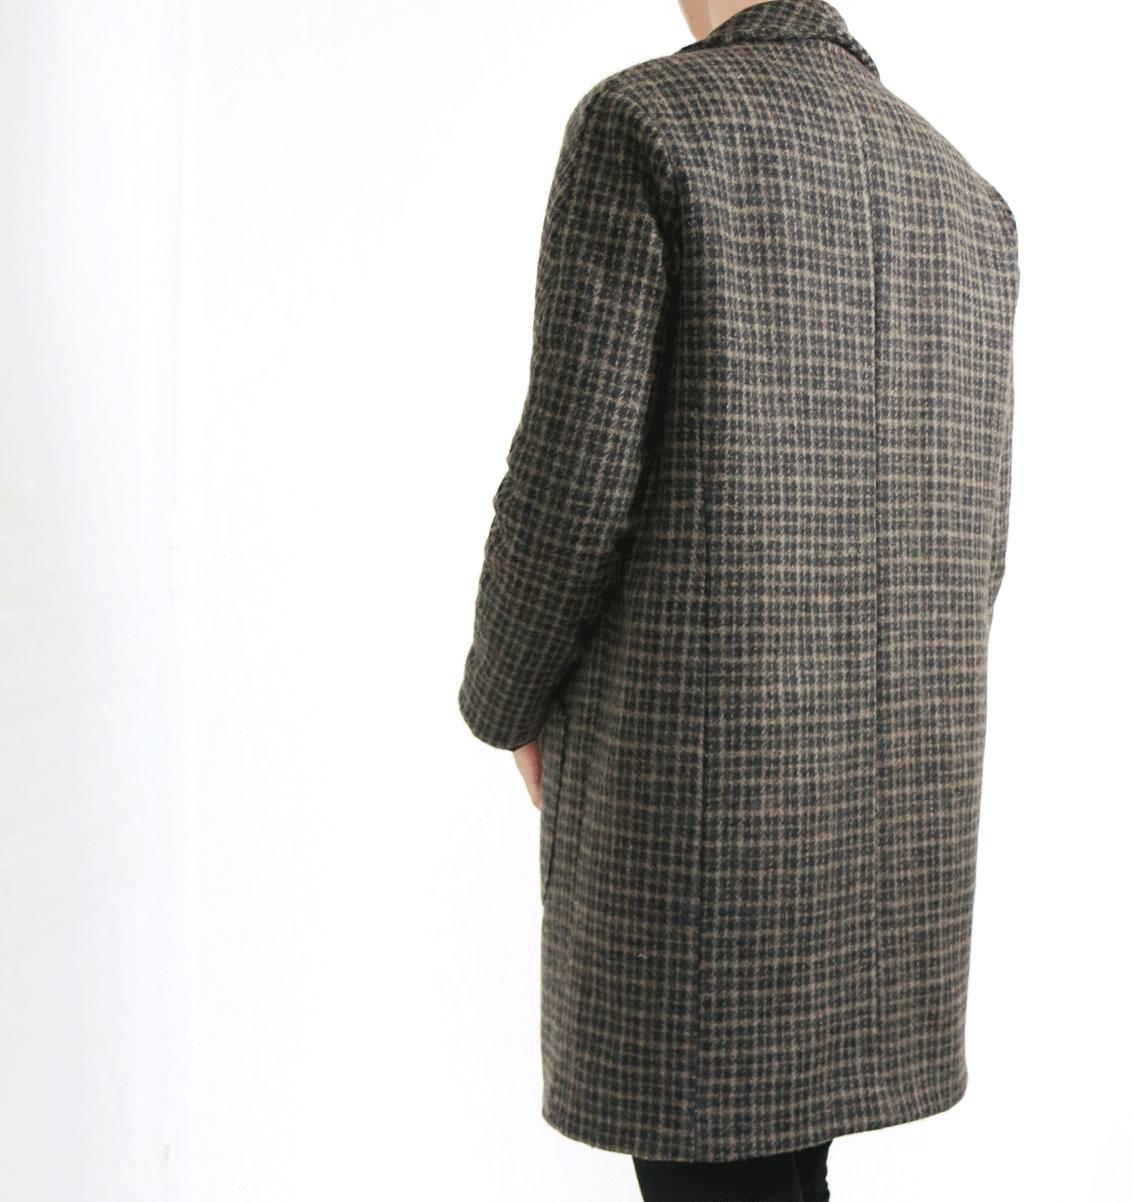 5-manteau-franceduvalstalla-anna-ka-bazaar-patron-couture-atelier-scammit